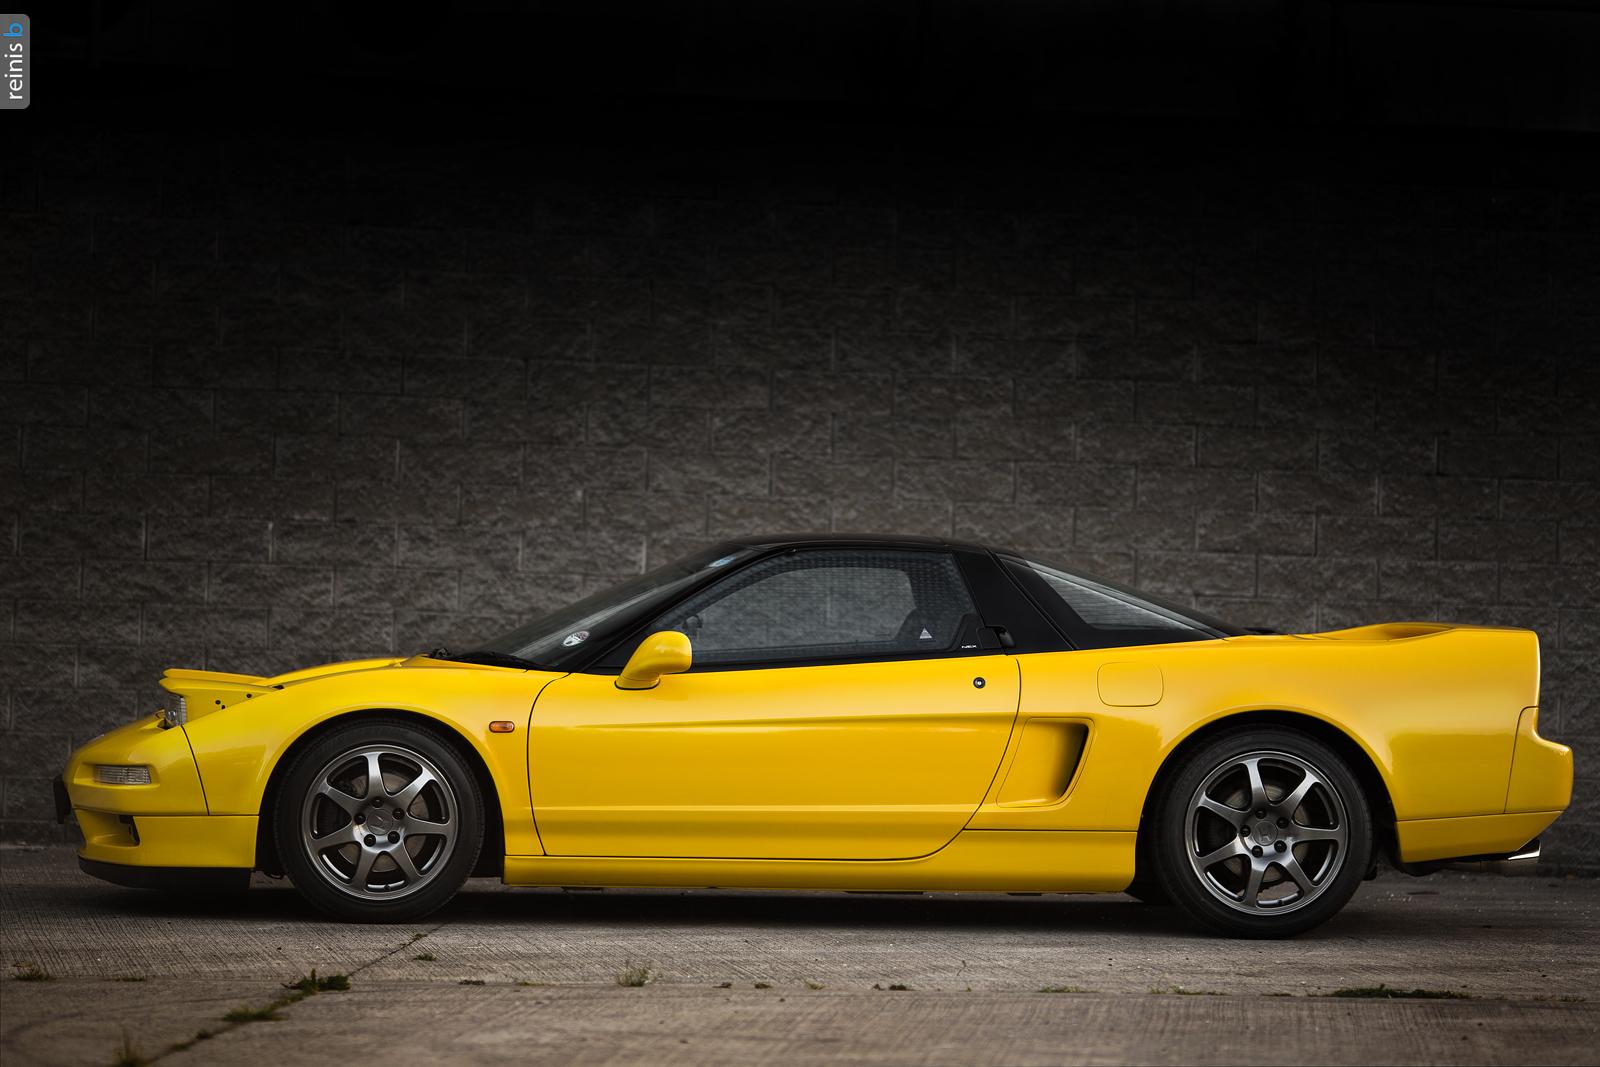 Jdm Cars For Sale >> Honda Nsx Type R Jdm | Car Interior Design